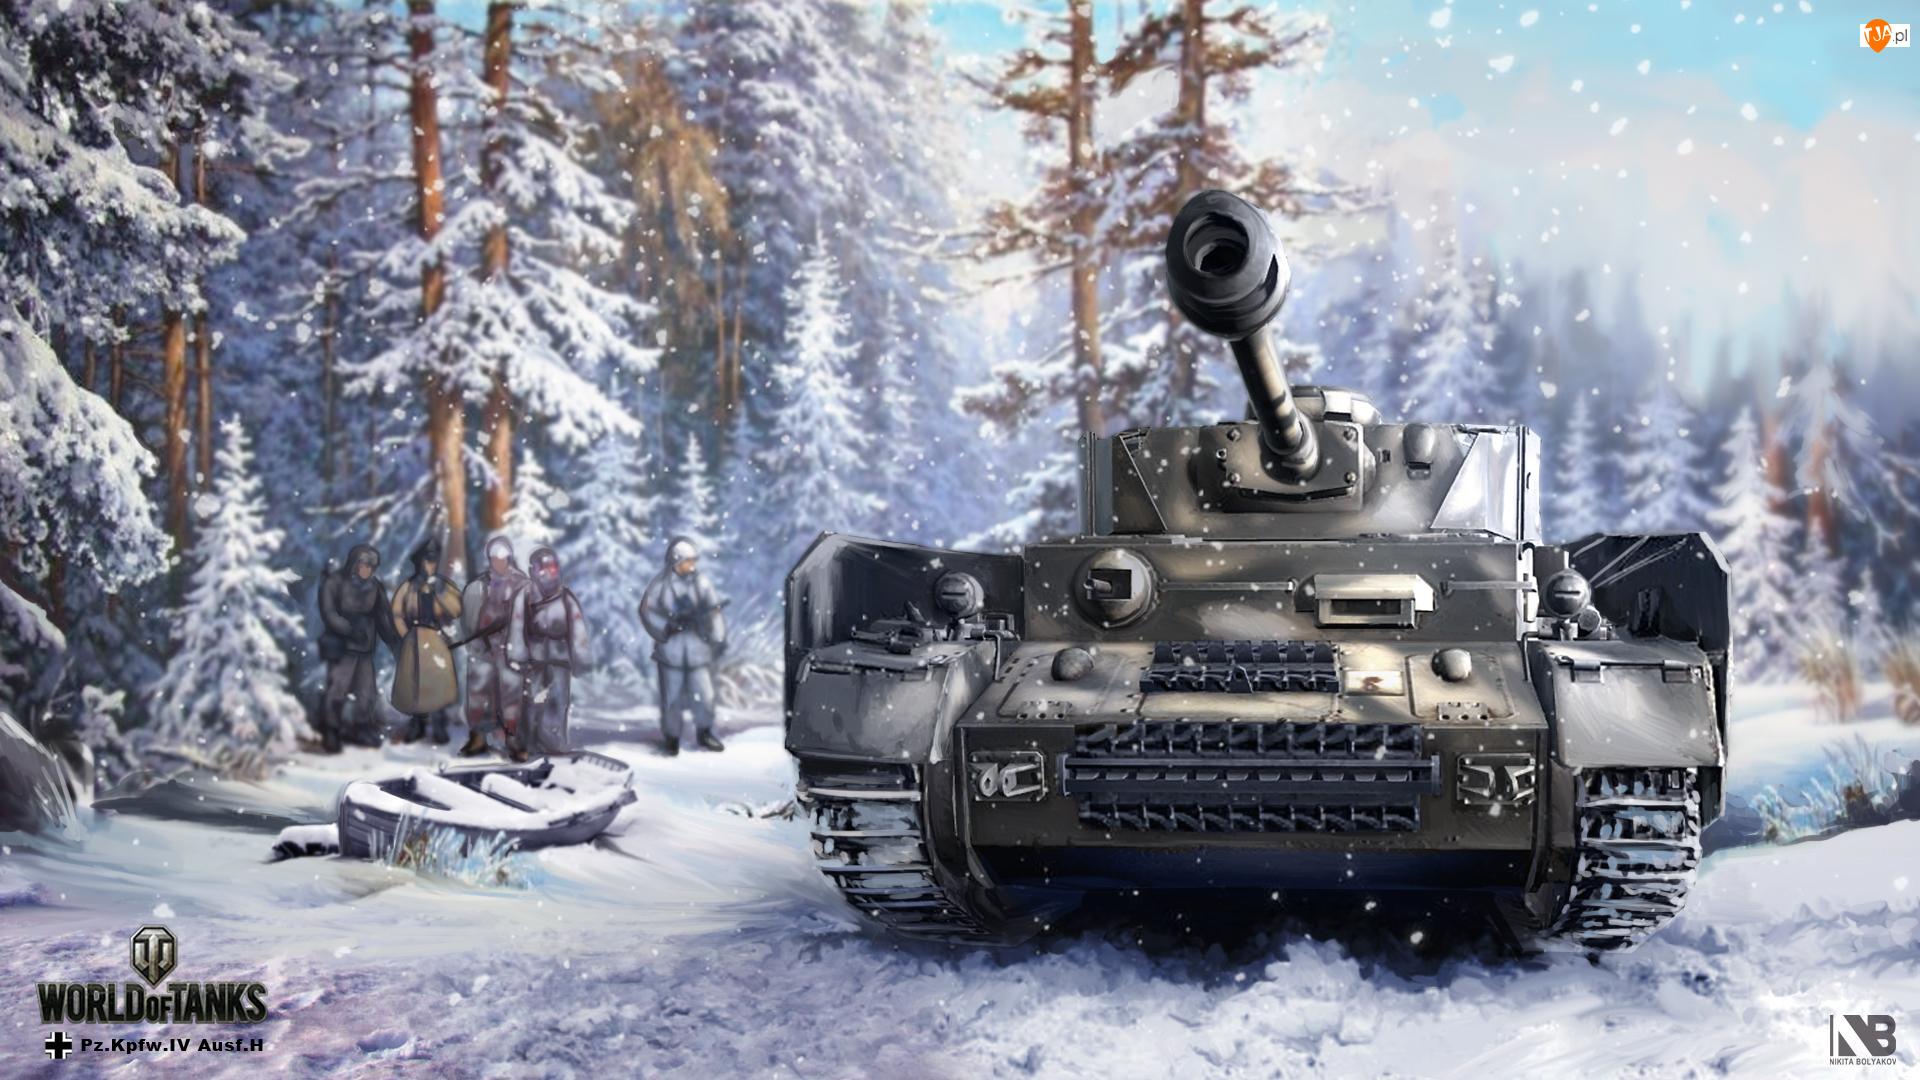 Śnieg, Czołg, World of Tanks, Pz.Kpfw.IV Ausf.H, Nikita Bolyakov, Zima